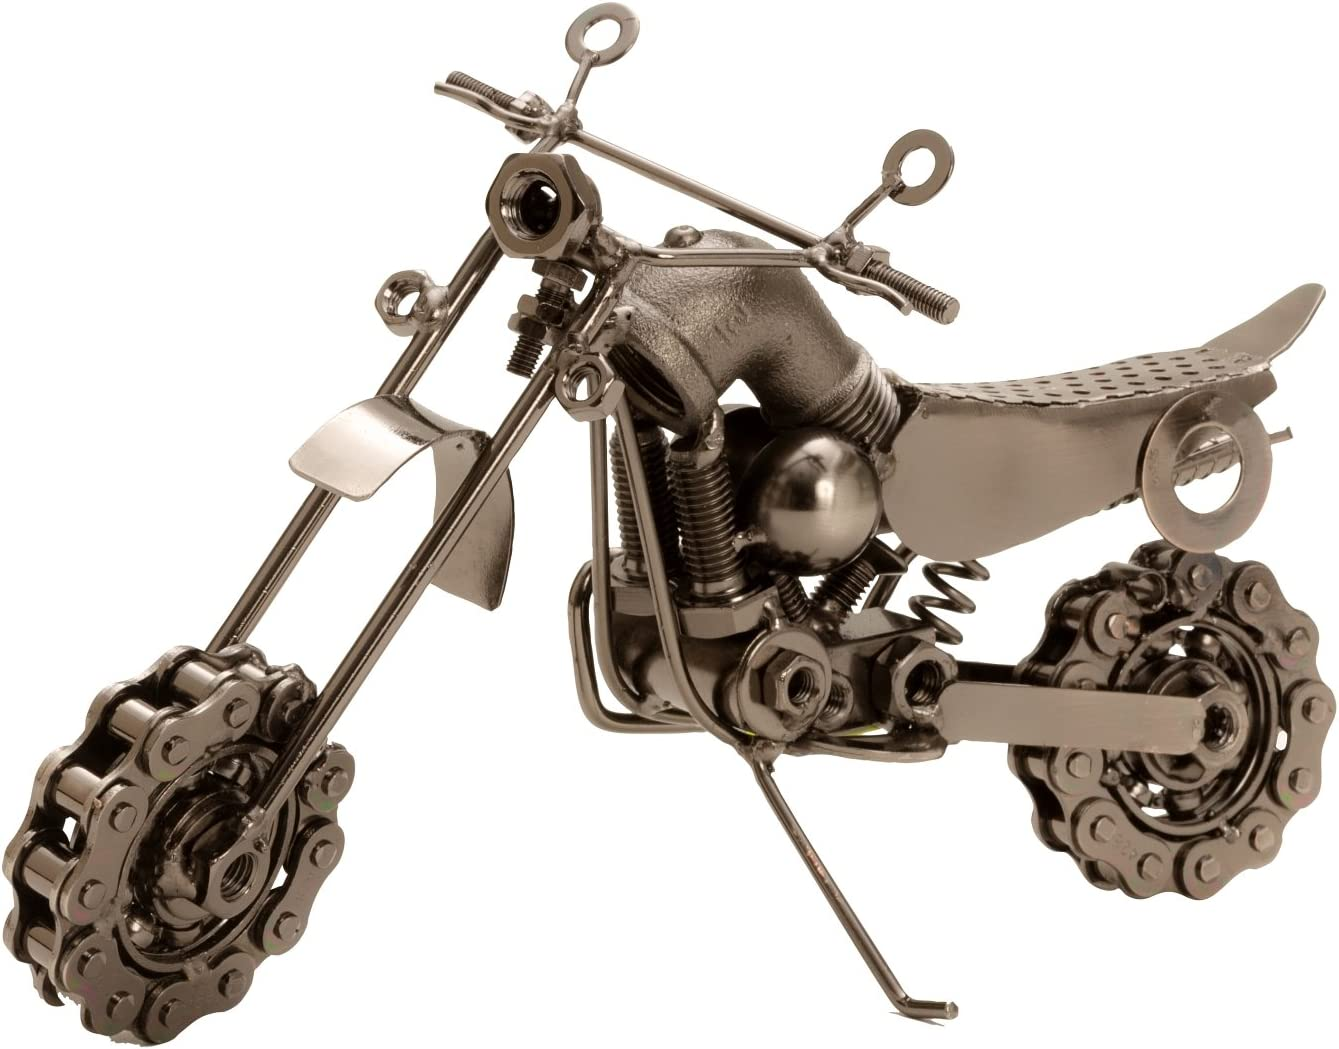 Lifestyle /& More Skulptur Dekofigur Motorrad aus Metall in Silber L/änge 25 cm H/öhe 14 cm